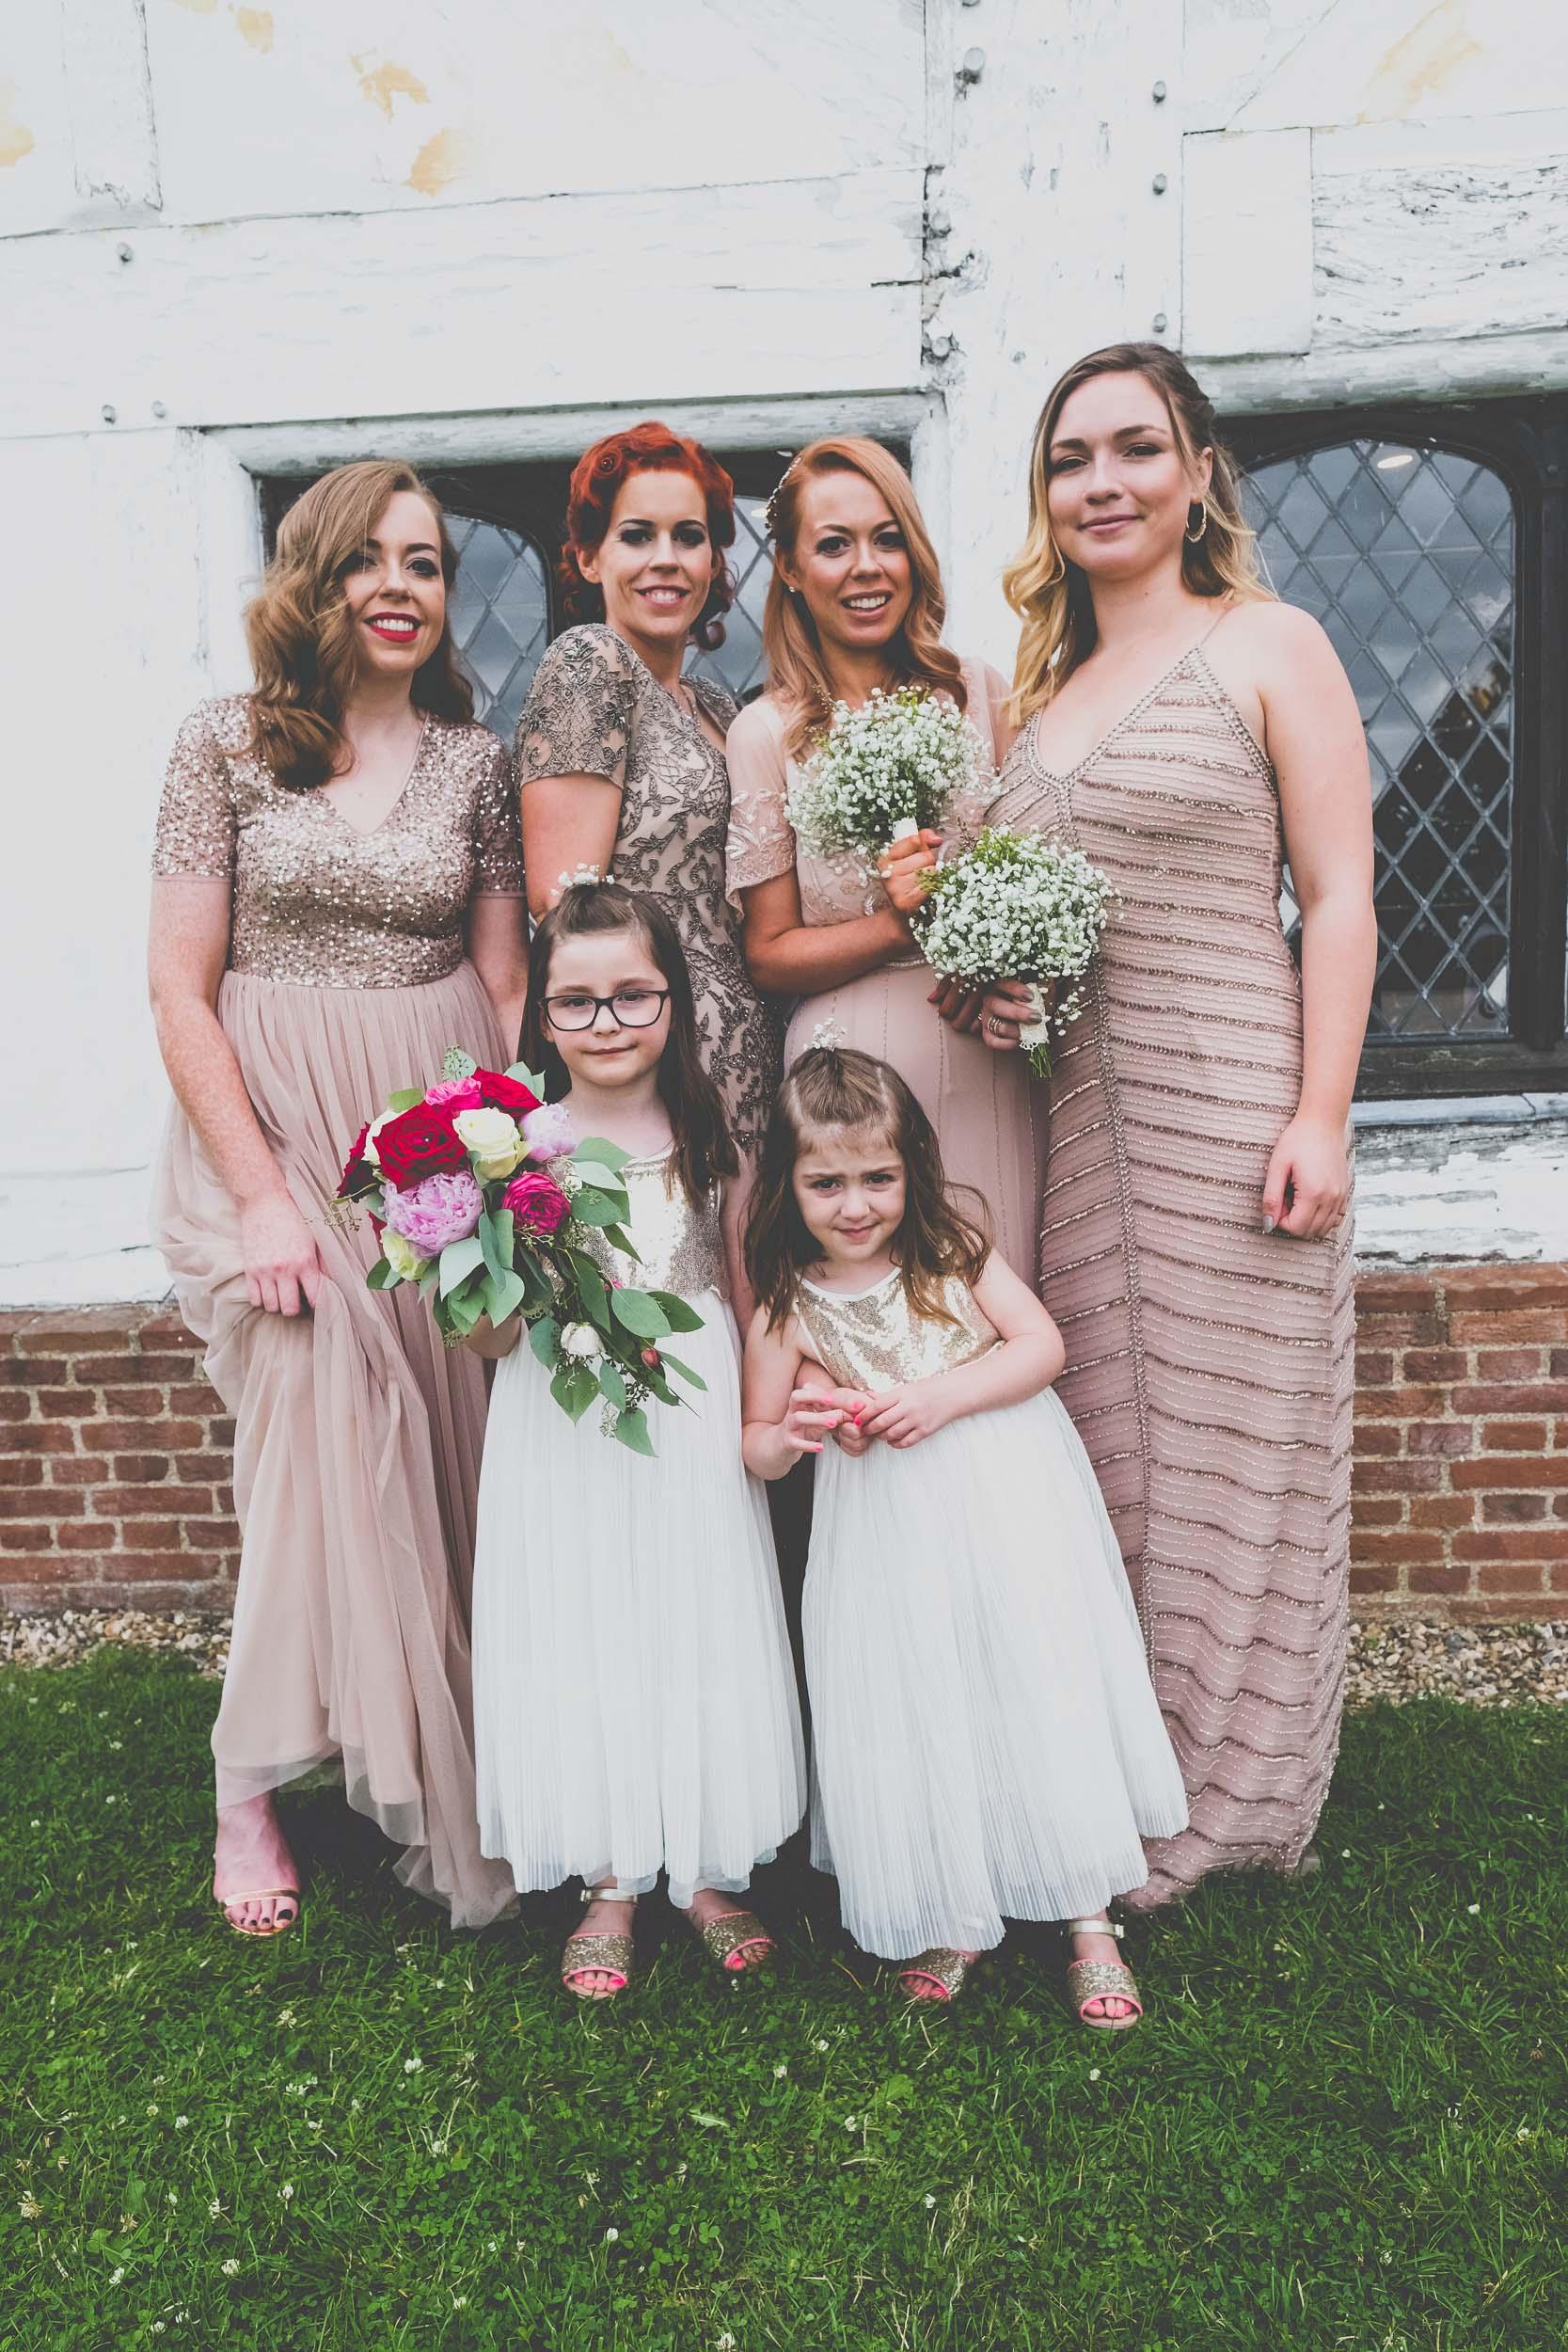 queen-elizabeths-hunting-lodge-epping-forest-wedding181.jpg